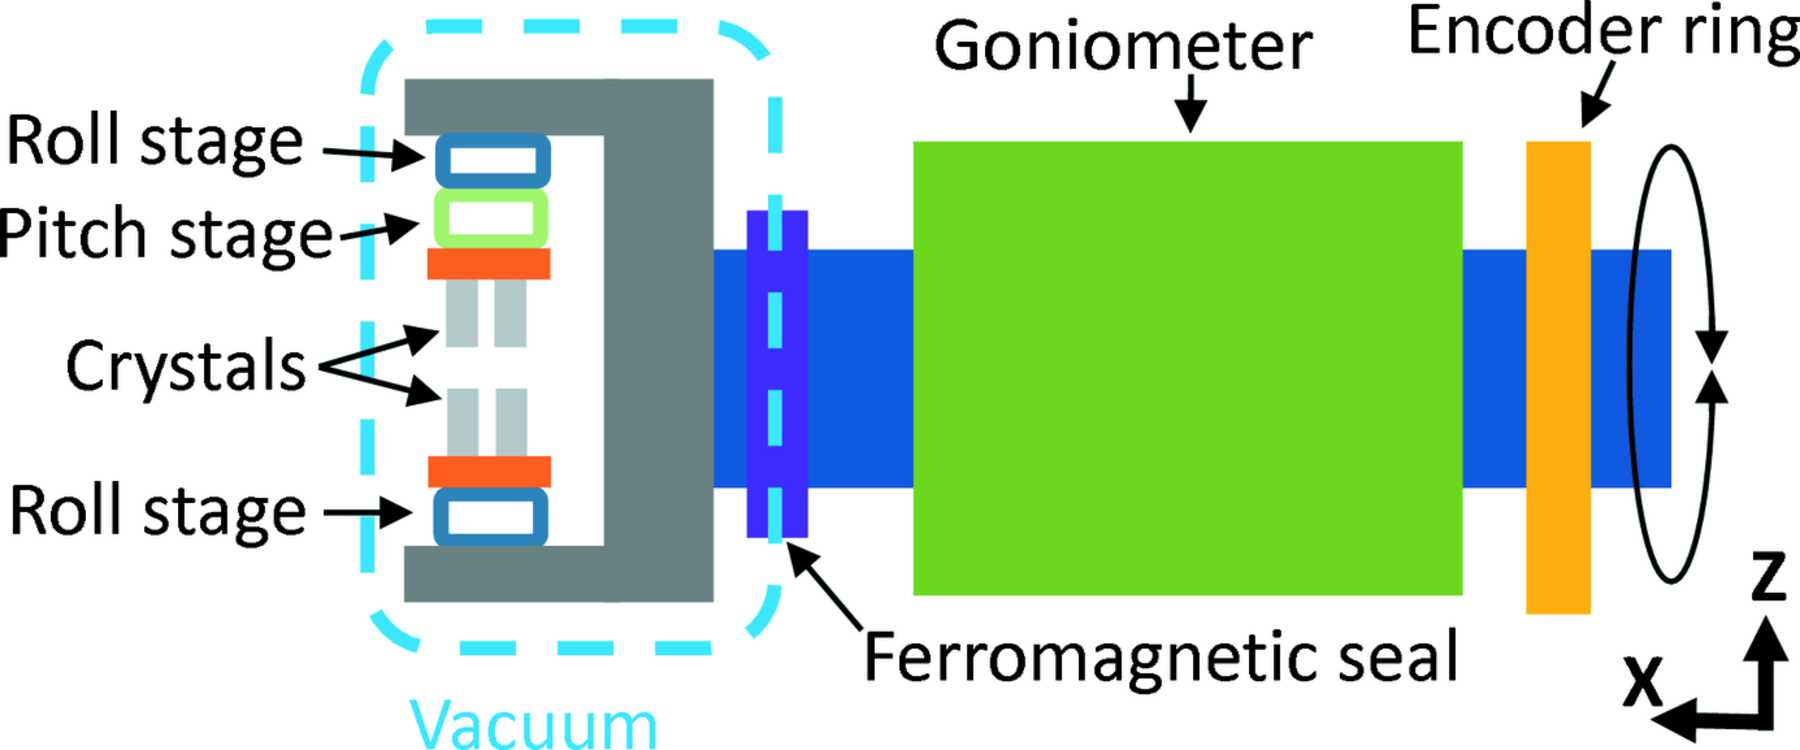 IUCr) Vibration measurements of high-heat-load